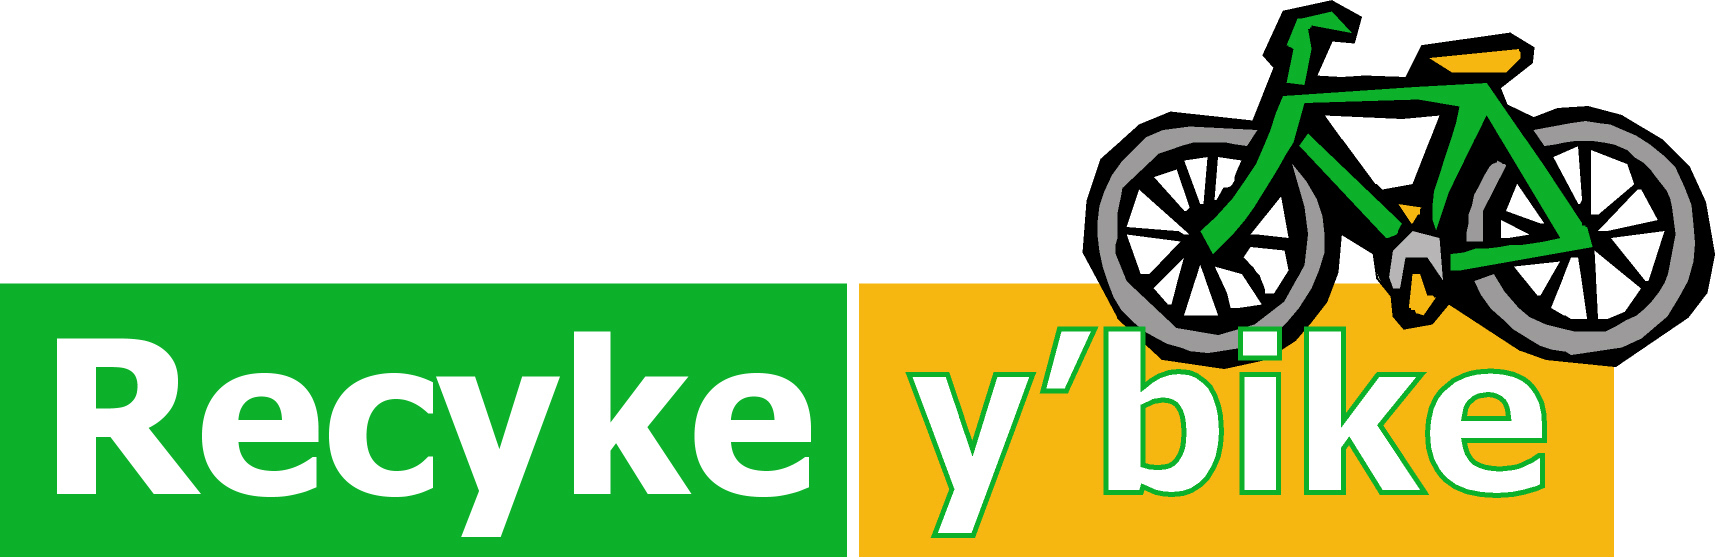 Recyke y'bike logo